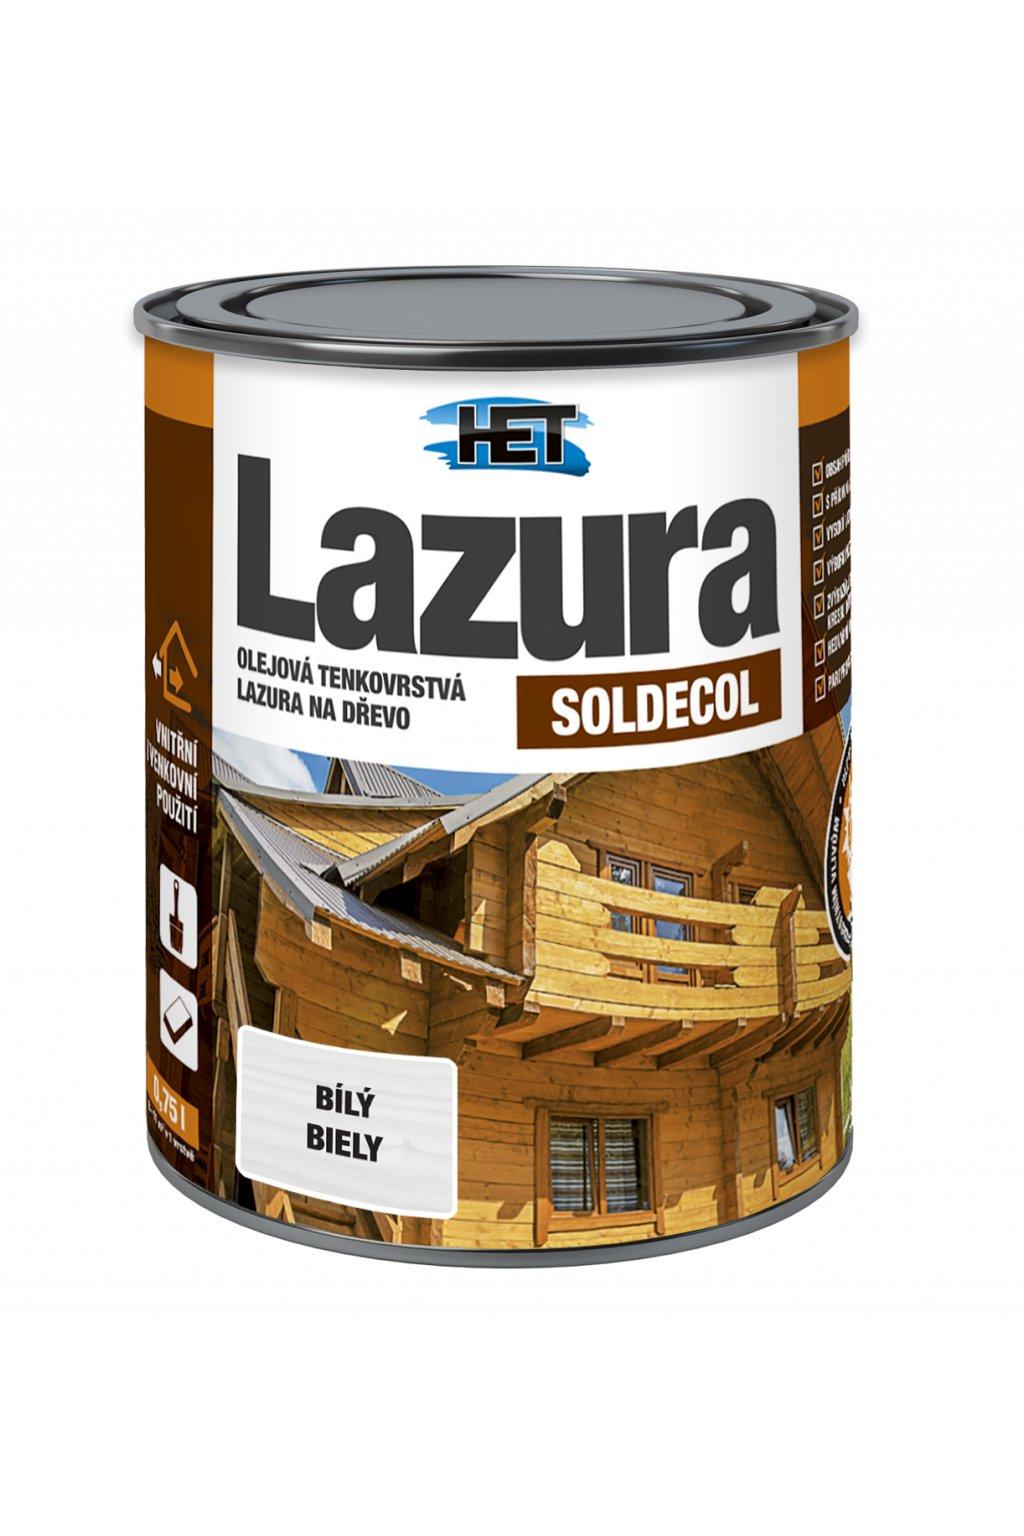 Soldecol Lazura 0,75l 2020